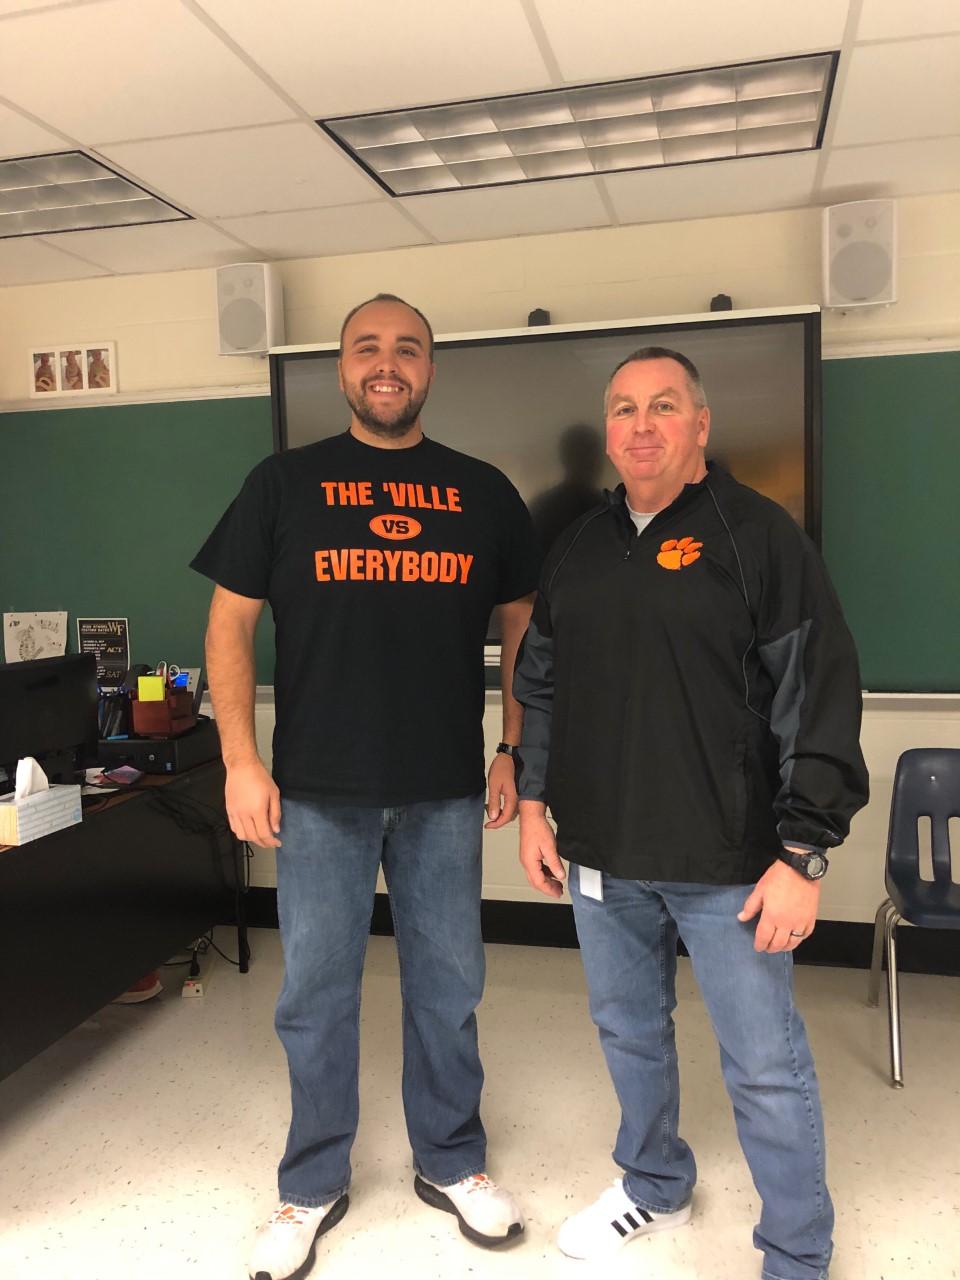 Mr. Joe Mullinax (left) and Mr. Rodney Manuel (right) co-teach classes at BDHS.